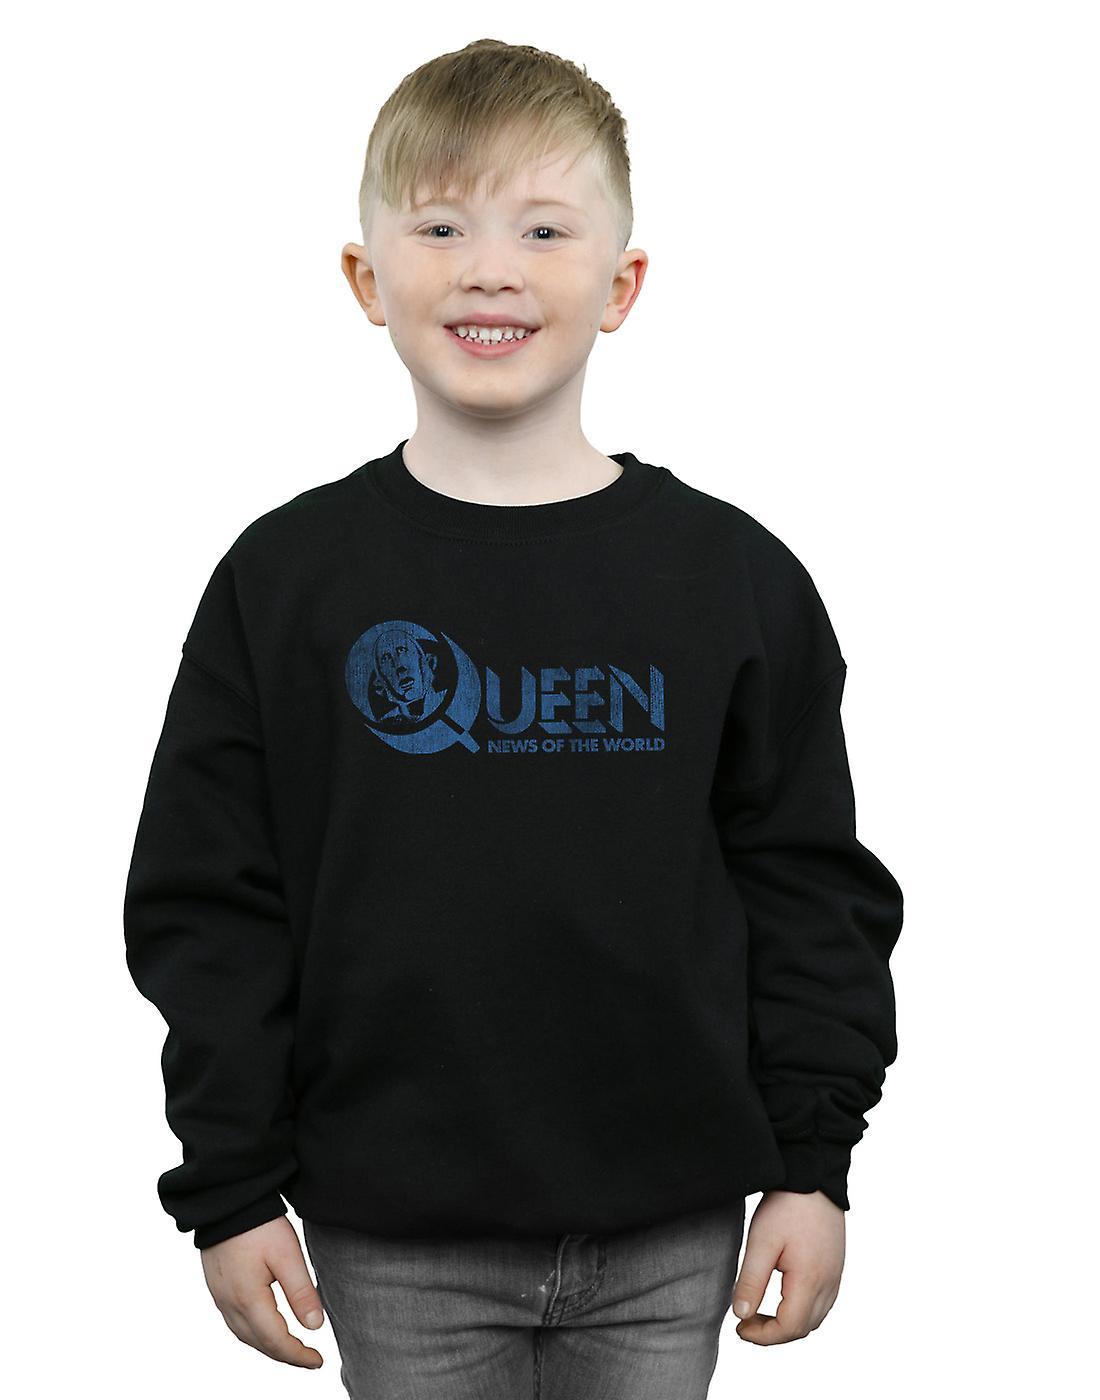 Queen Boys Distressed News Of The World Sweatshirt